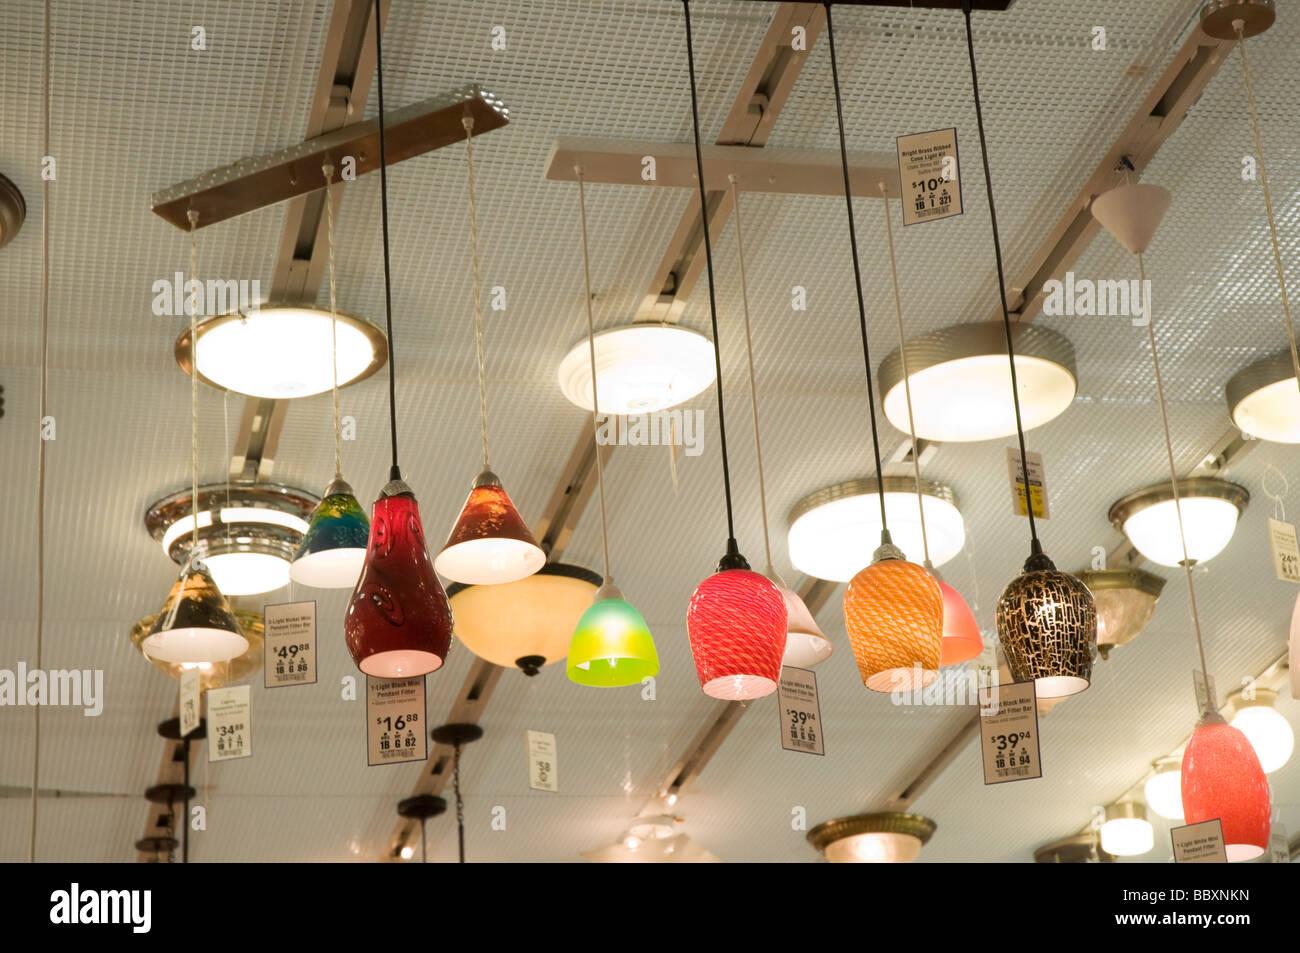 Lowes Store Interior Stockfotos & Lowes Store Interior Bilder - Alamy